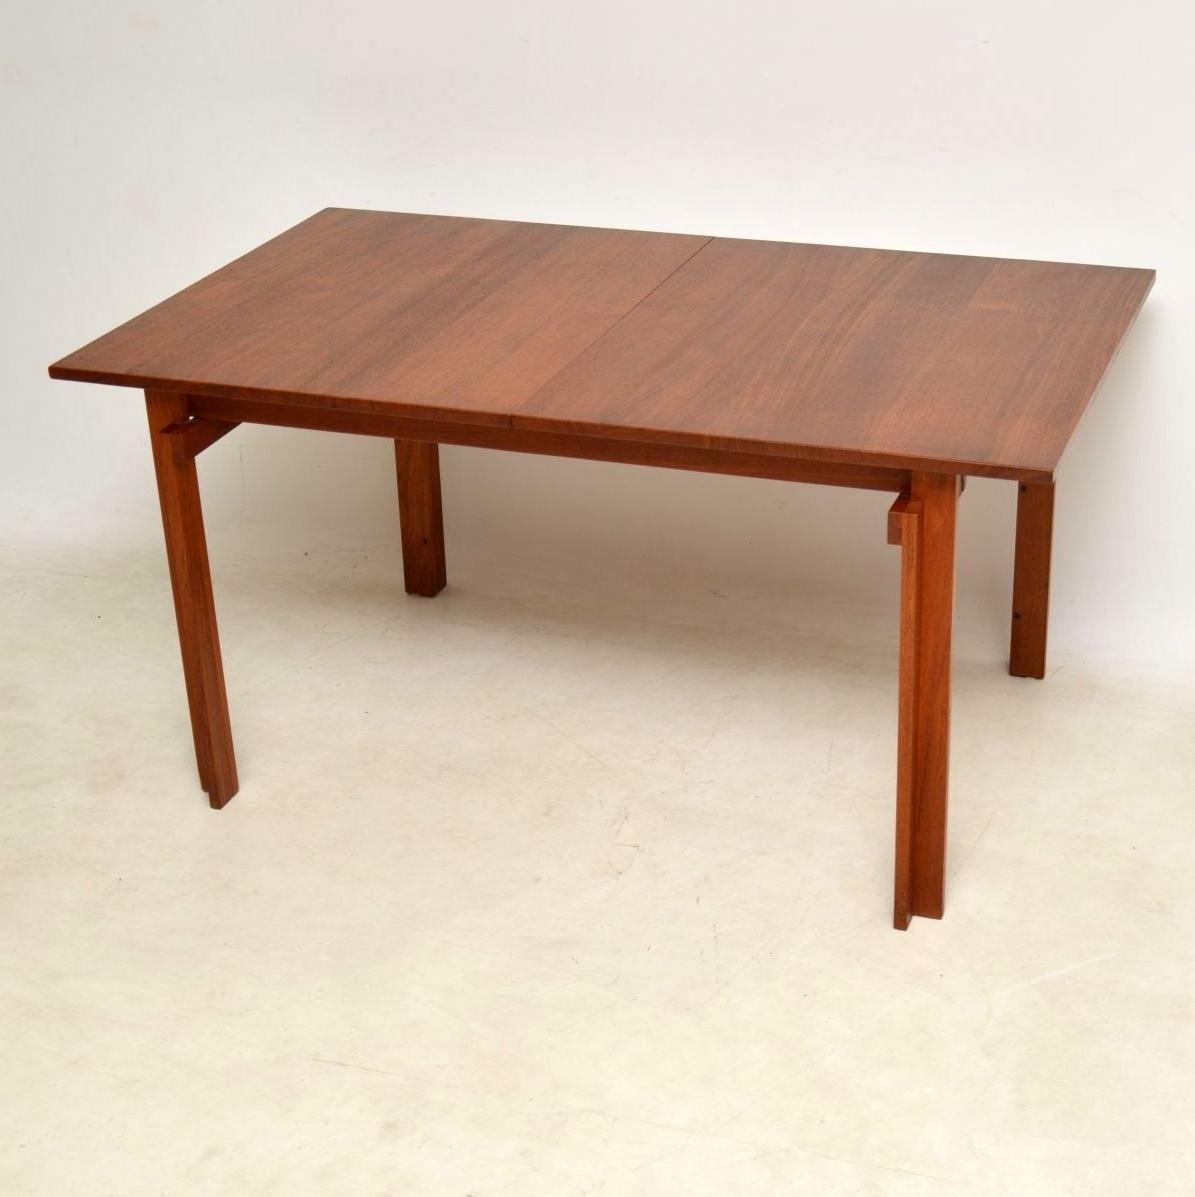 Preferred 1960's Vintage Danish Teak Dining Tableinger Klingenberg For Pertaining To Danish Dining Tables (View 19 of 25)